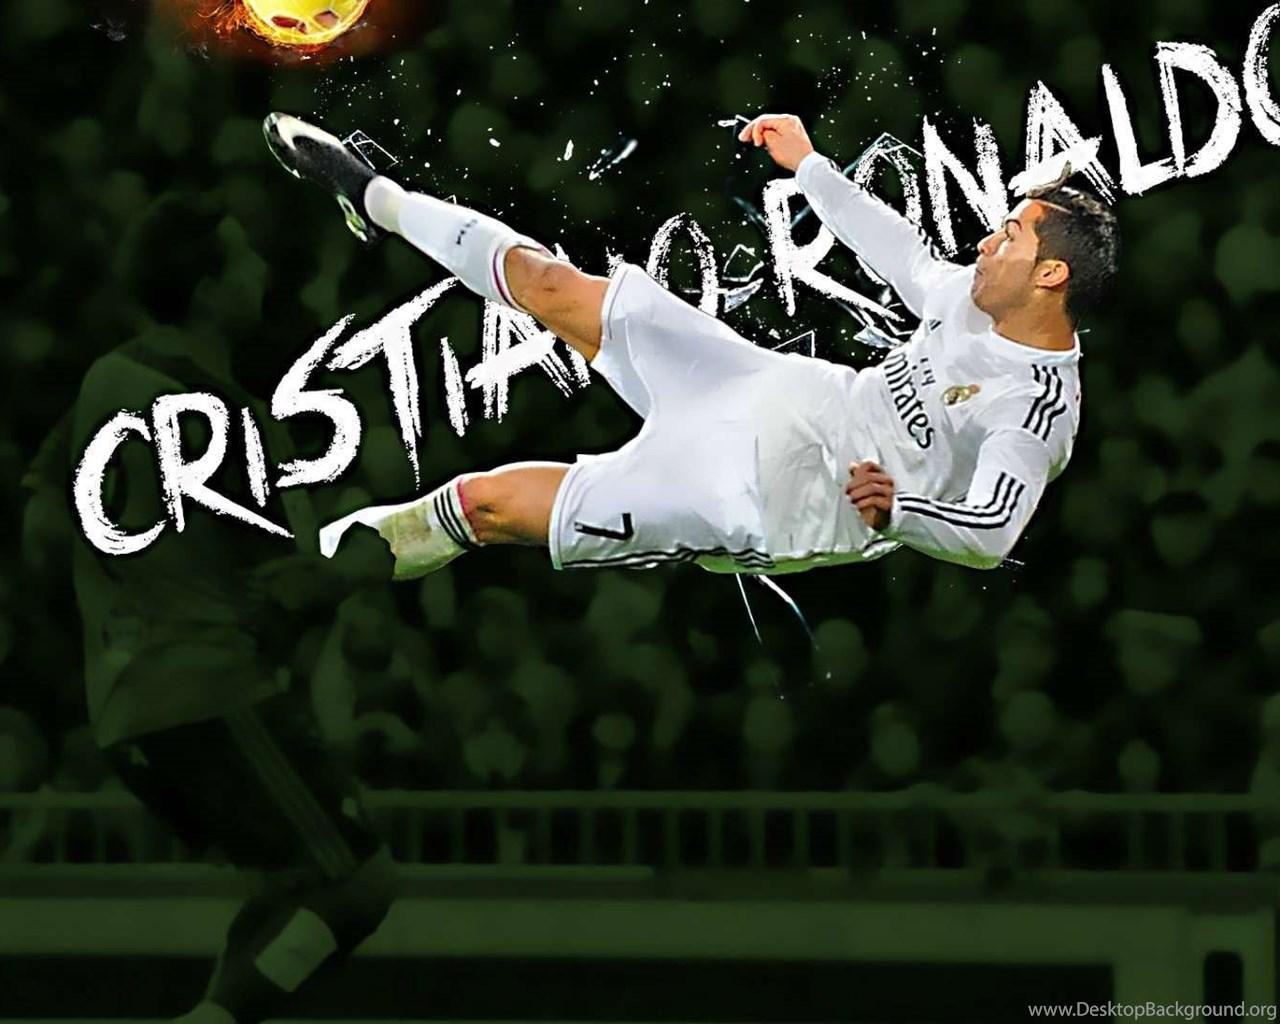 Ronaldo Football Wallpapers Hd Desktop Background